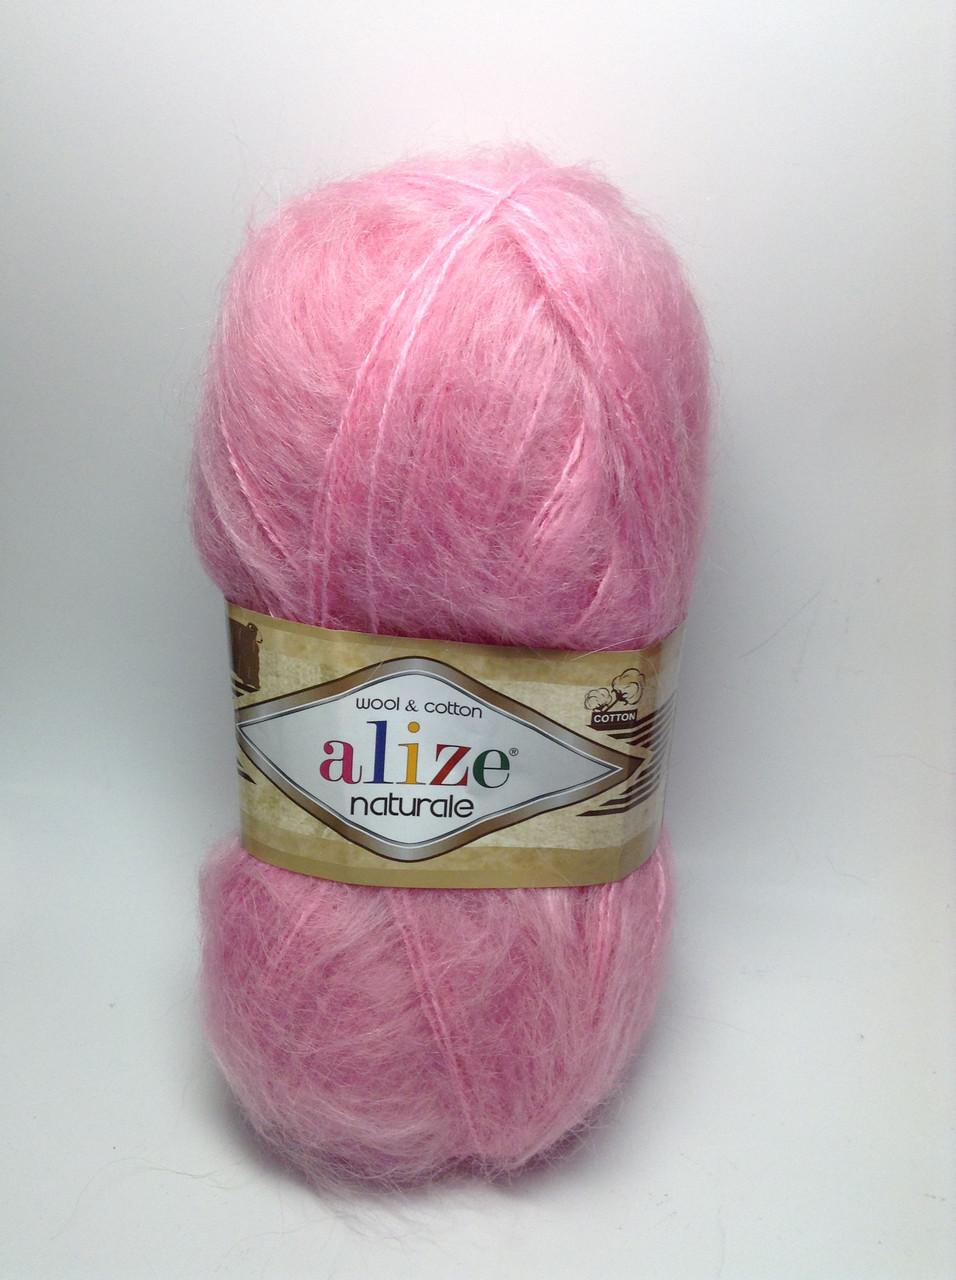 Пряжа naturale Alize wool & cotton